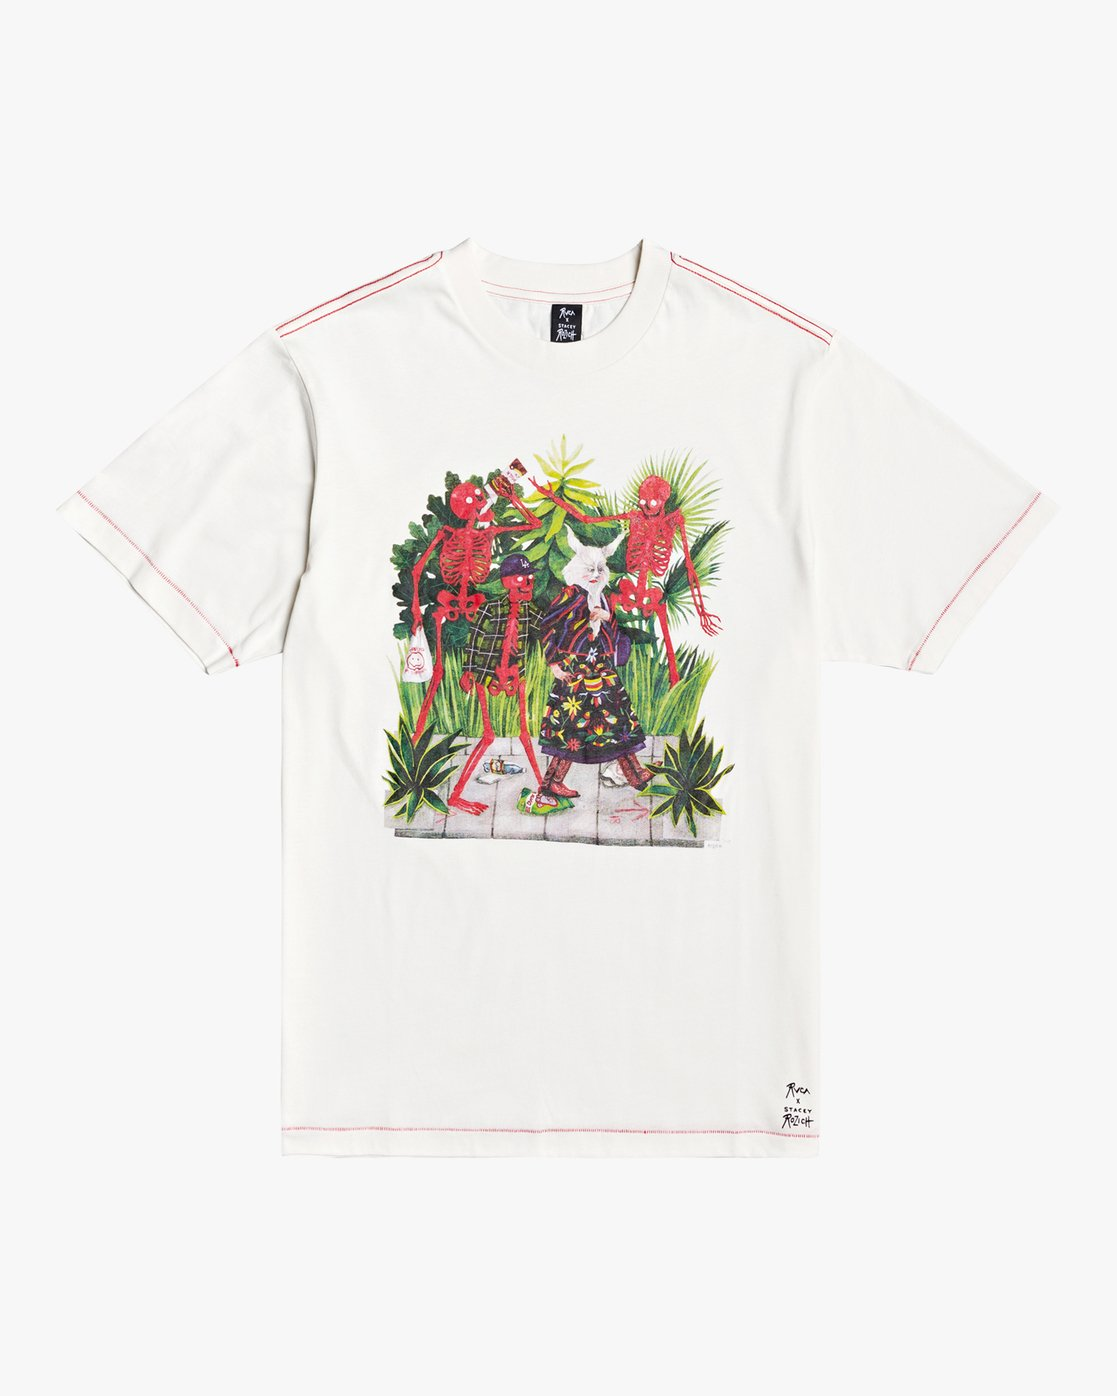 0 Stacey Rozich Bone - T-shirt pour Homme Blanc U1SSRFRVF0 RVCA